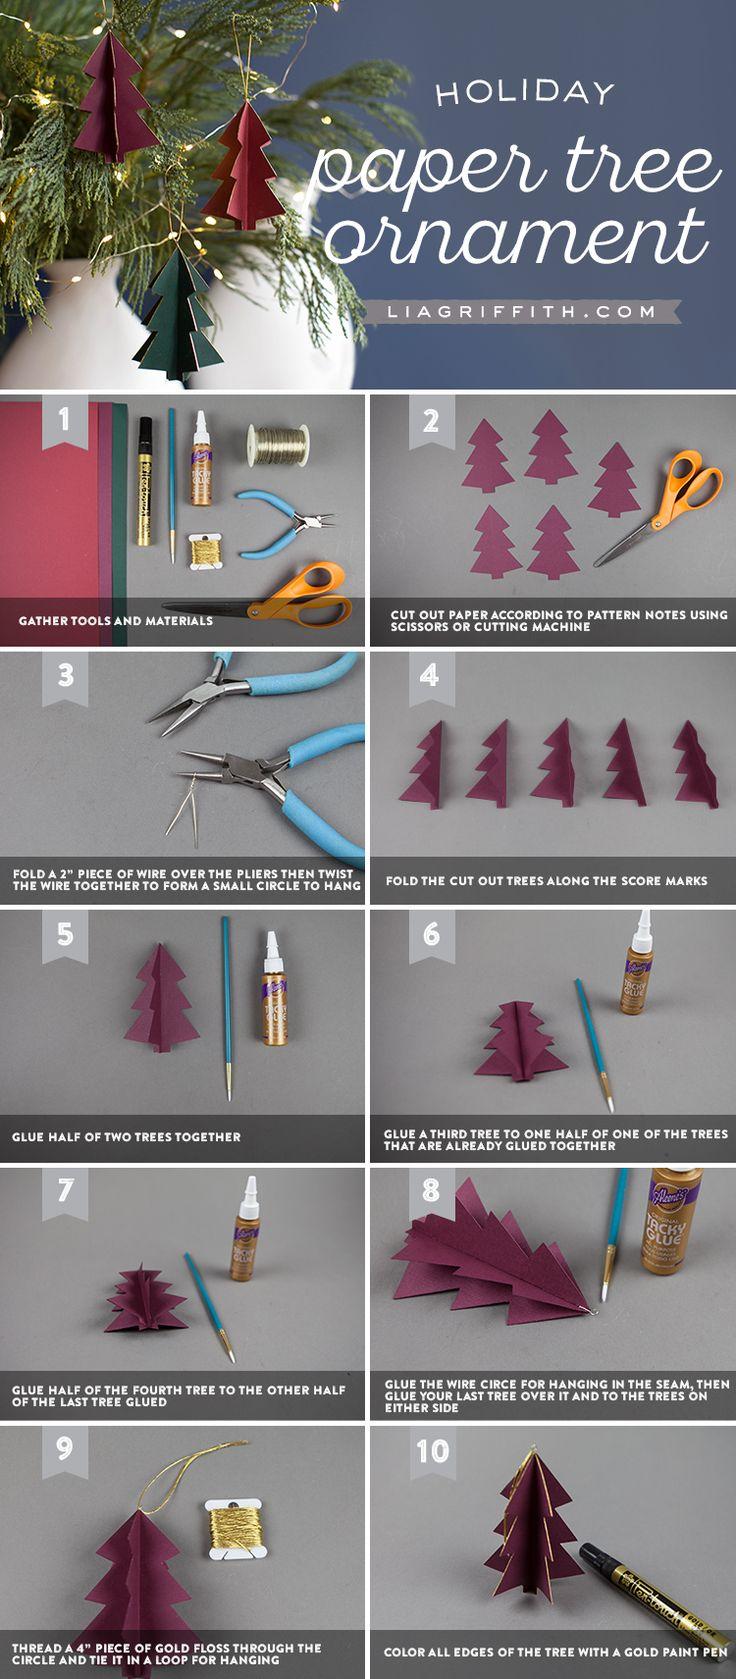 3D Paper Tree Ornaments - Lia Griffith - www.liagriffith.com #diyinspiration #diyidea #diyideas #diychristmas #diyholiday #diyholidays #paper #christmastree #madewithlia